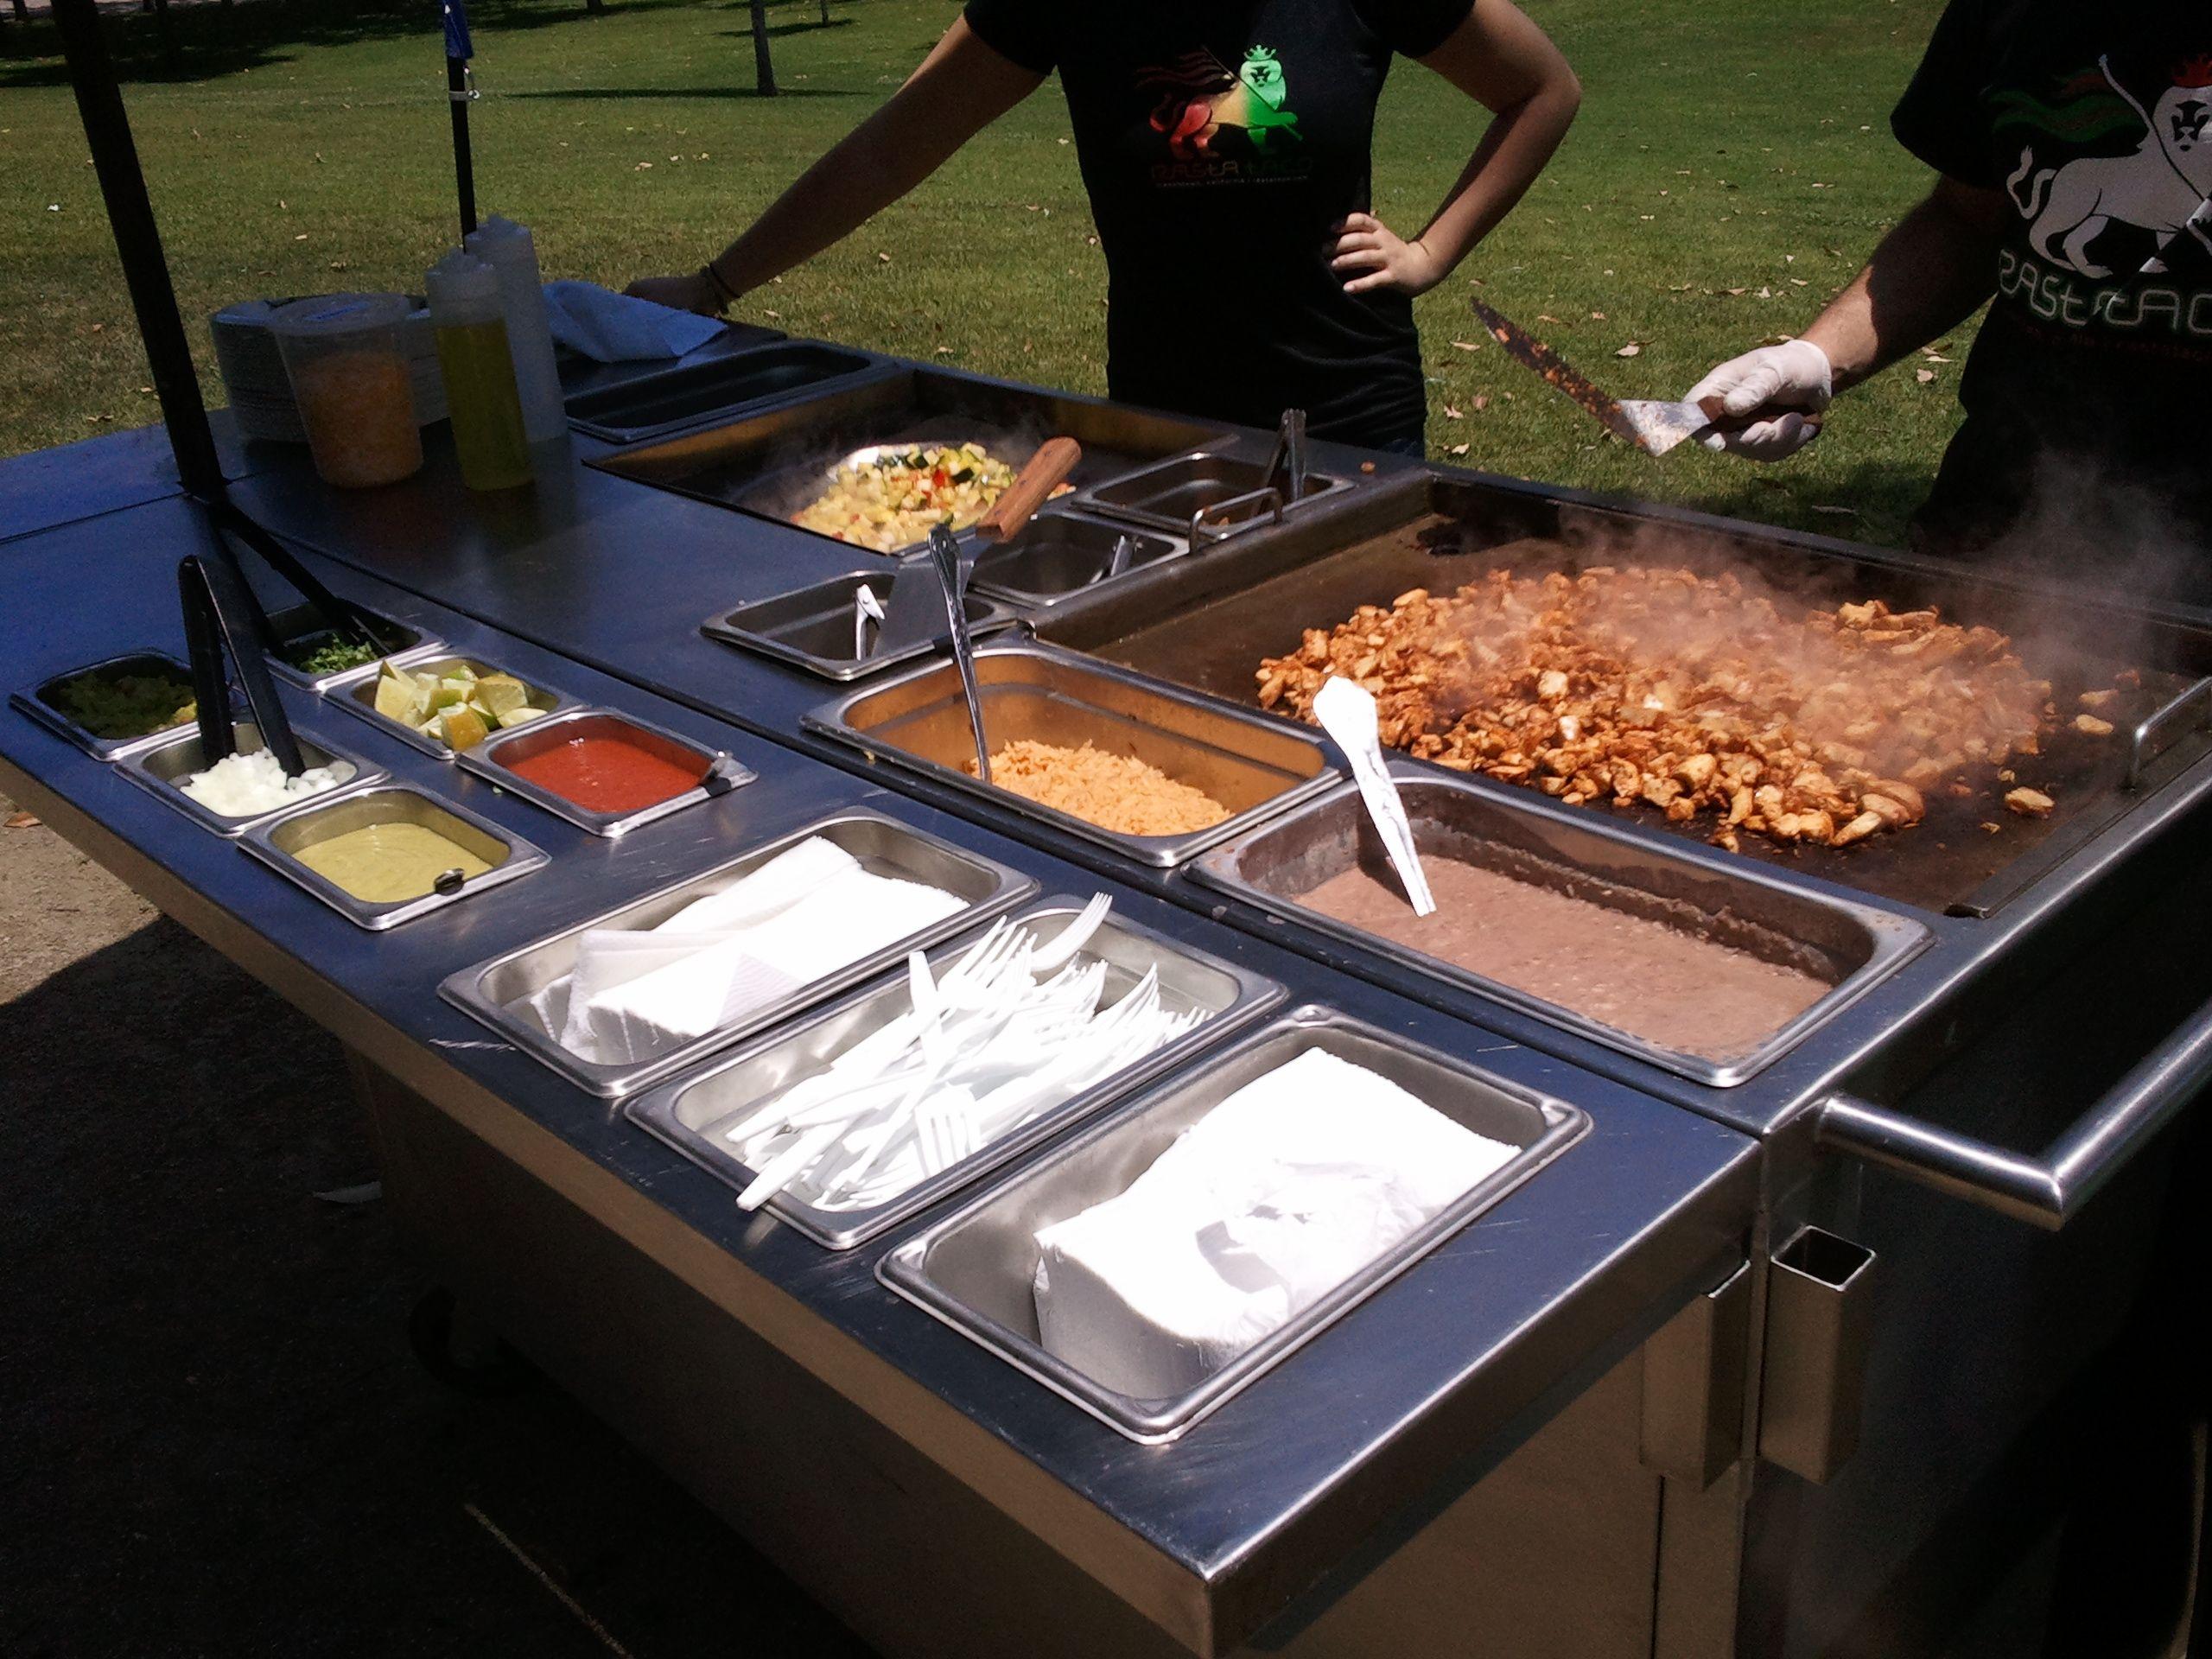 Food Sale: Catering Carts & Food Trucks: Street